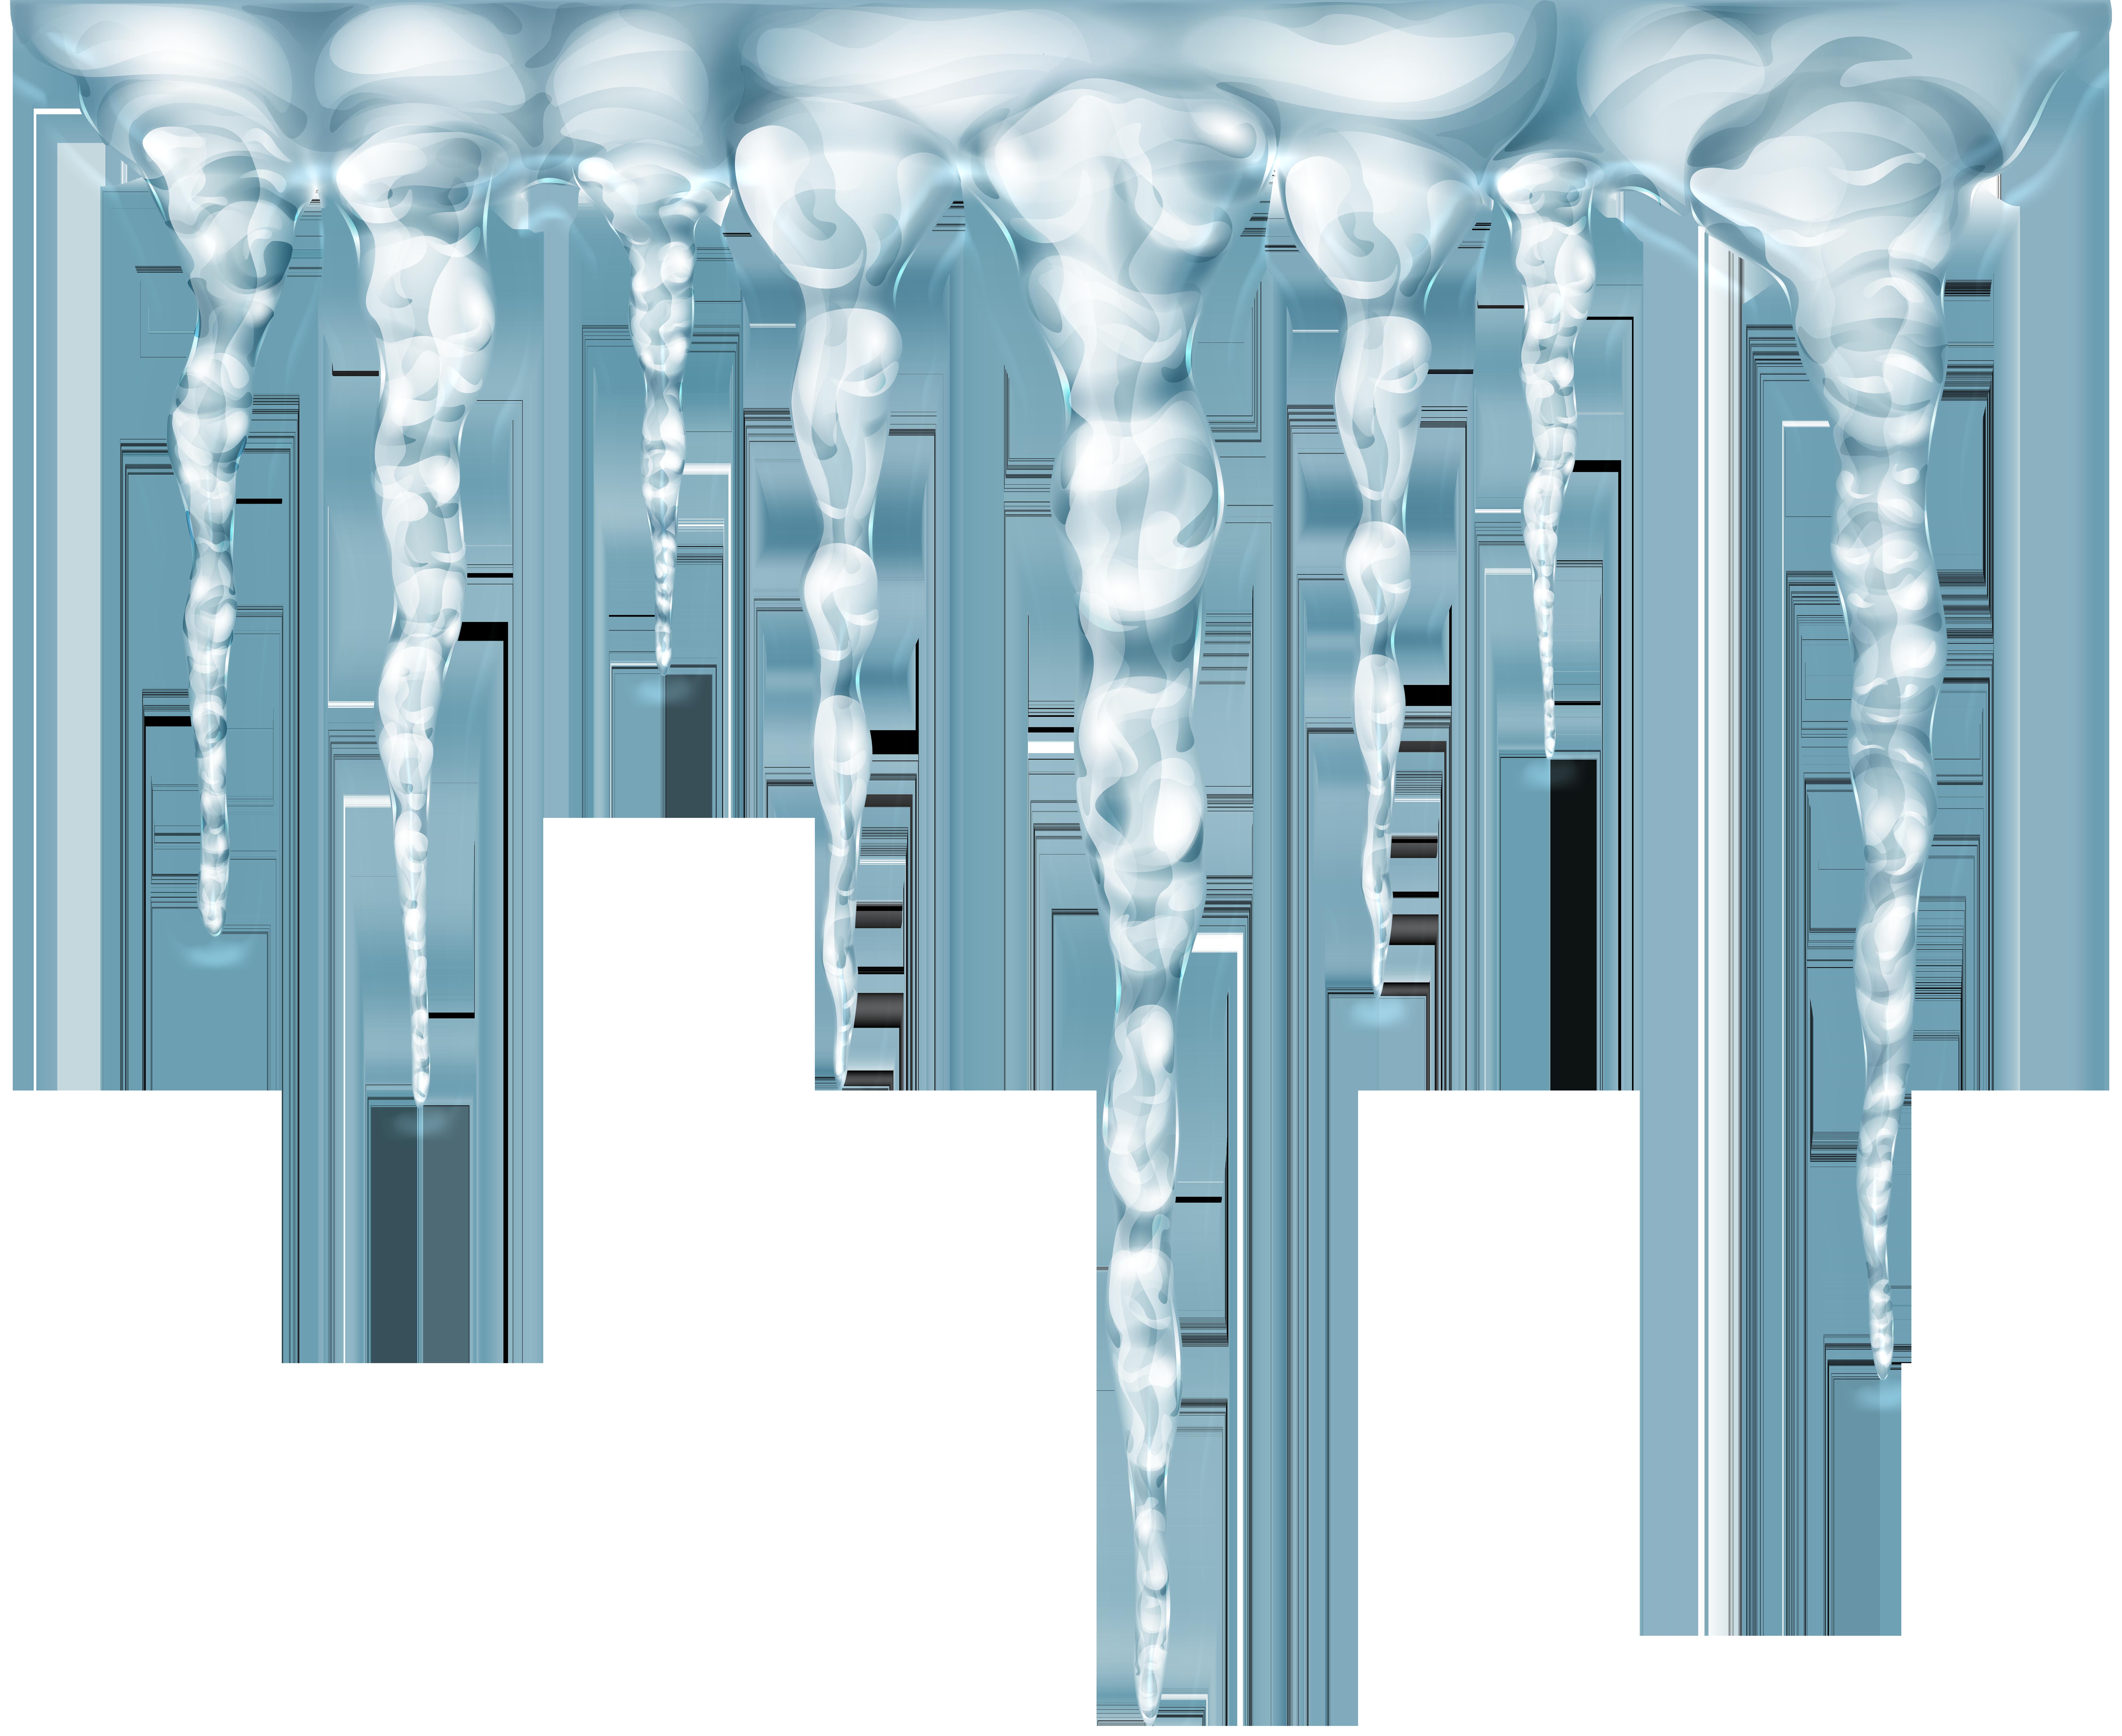 Transparent Icicles PNG Clip Art Image.